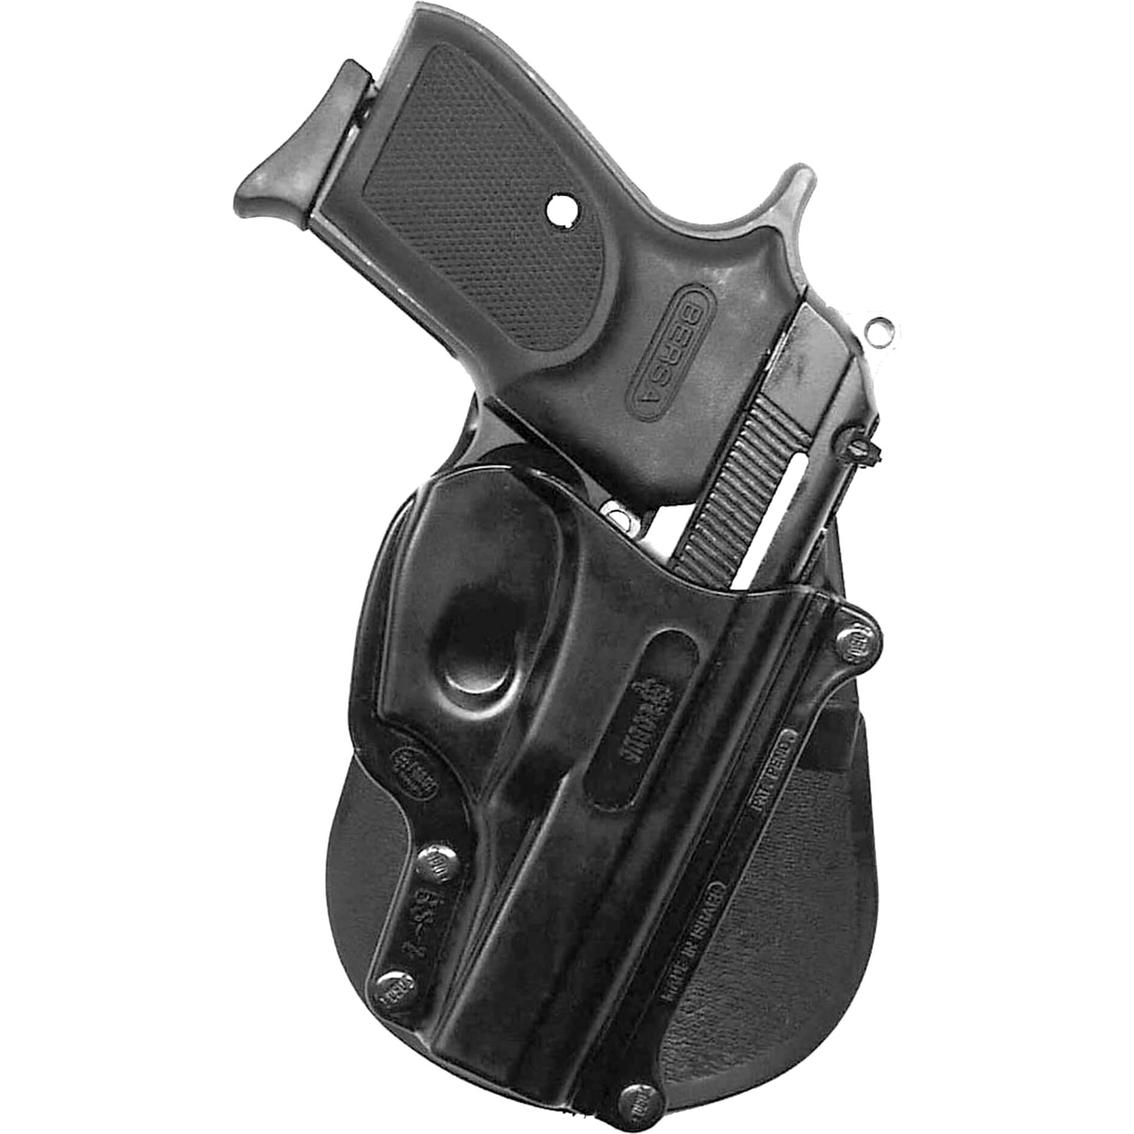 Fobus BS2 Black Right Hand Standard Paddle Bersa Thunder//Firestorm 380 Holster